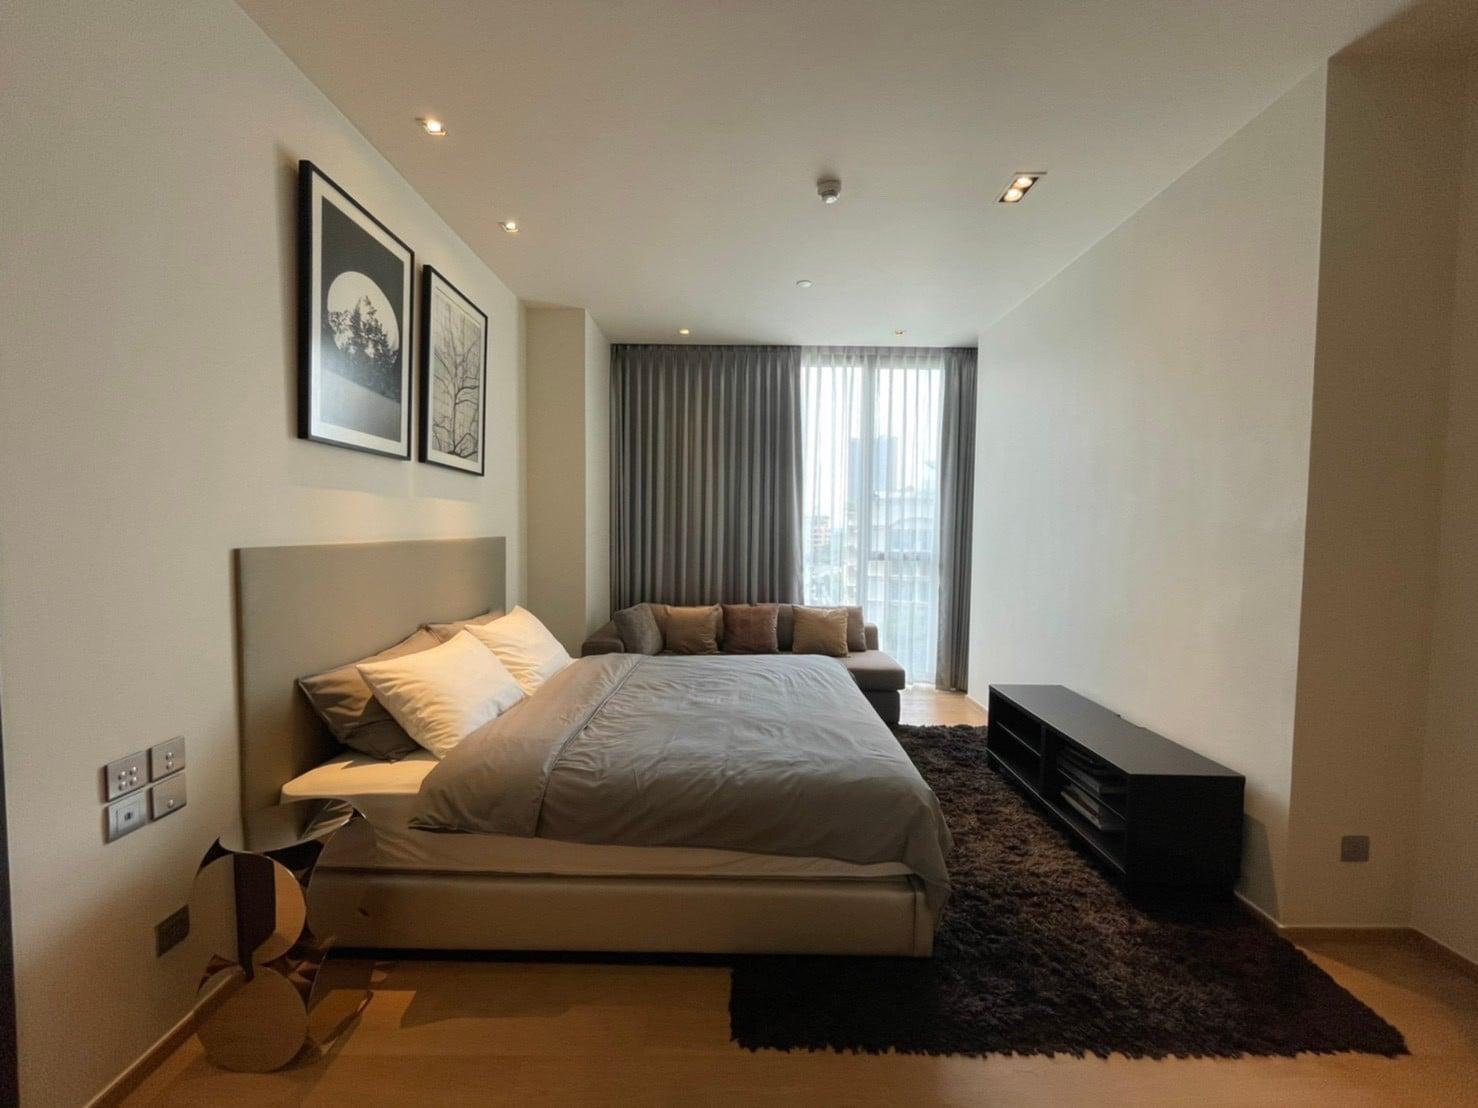 RARE ITEM! ให้เช่าคอนโด BEATNIQ Sukhumvit 32 คอนโดสุดหรูที่ตั้งอยู่ติดถนนสุขุมวิท ห้องใหม่ ตกแต่งสวยมากกก ราคาดีที่สุดในตอนนี้!!!!